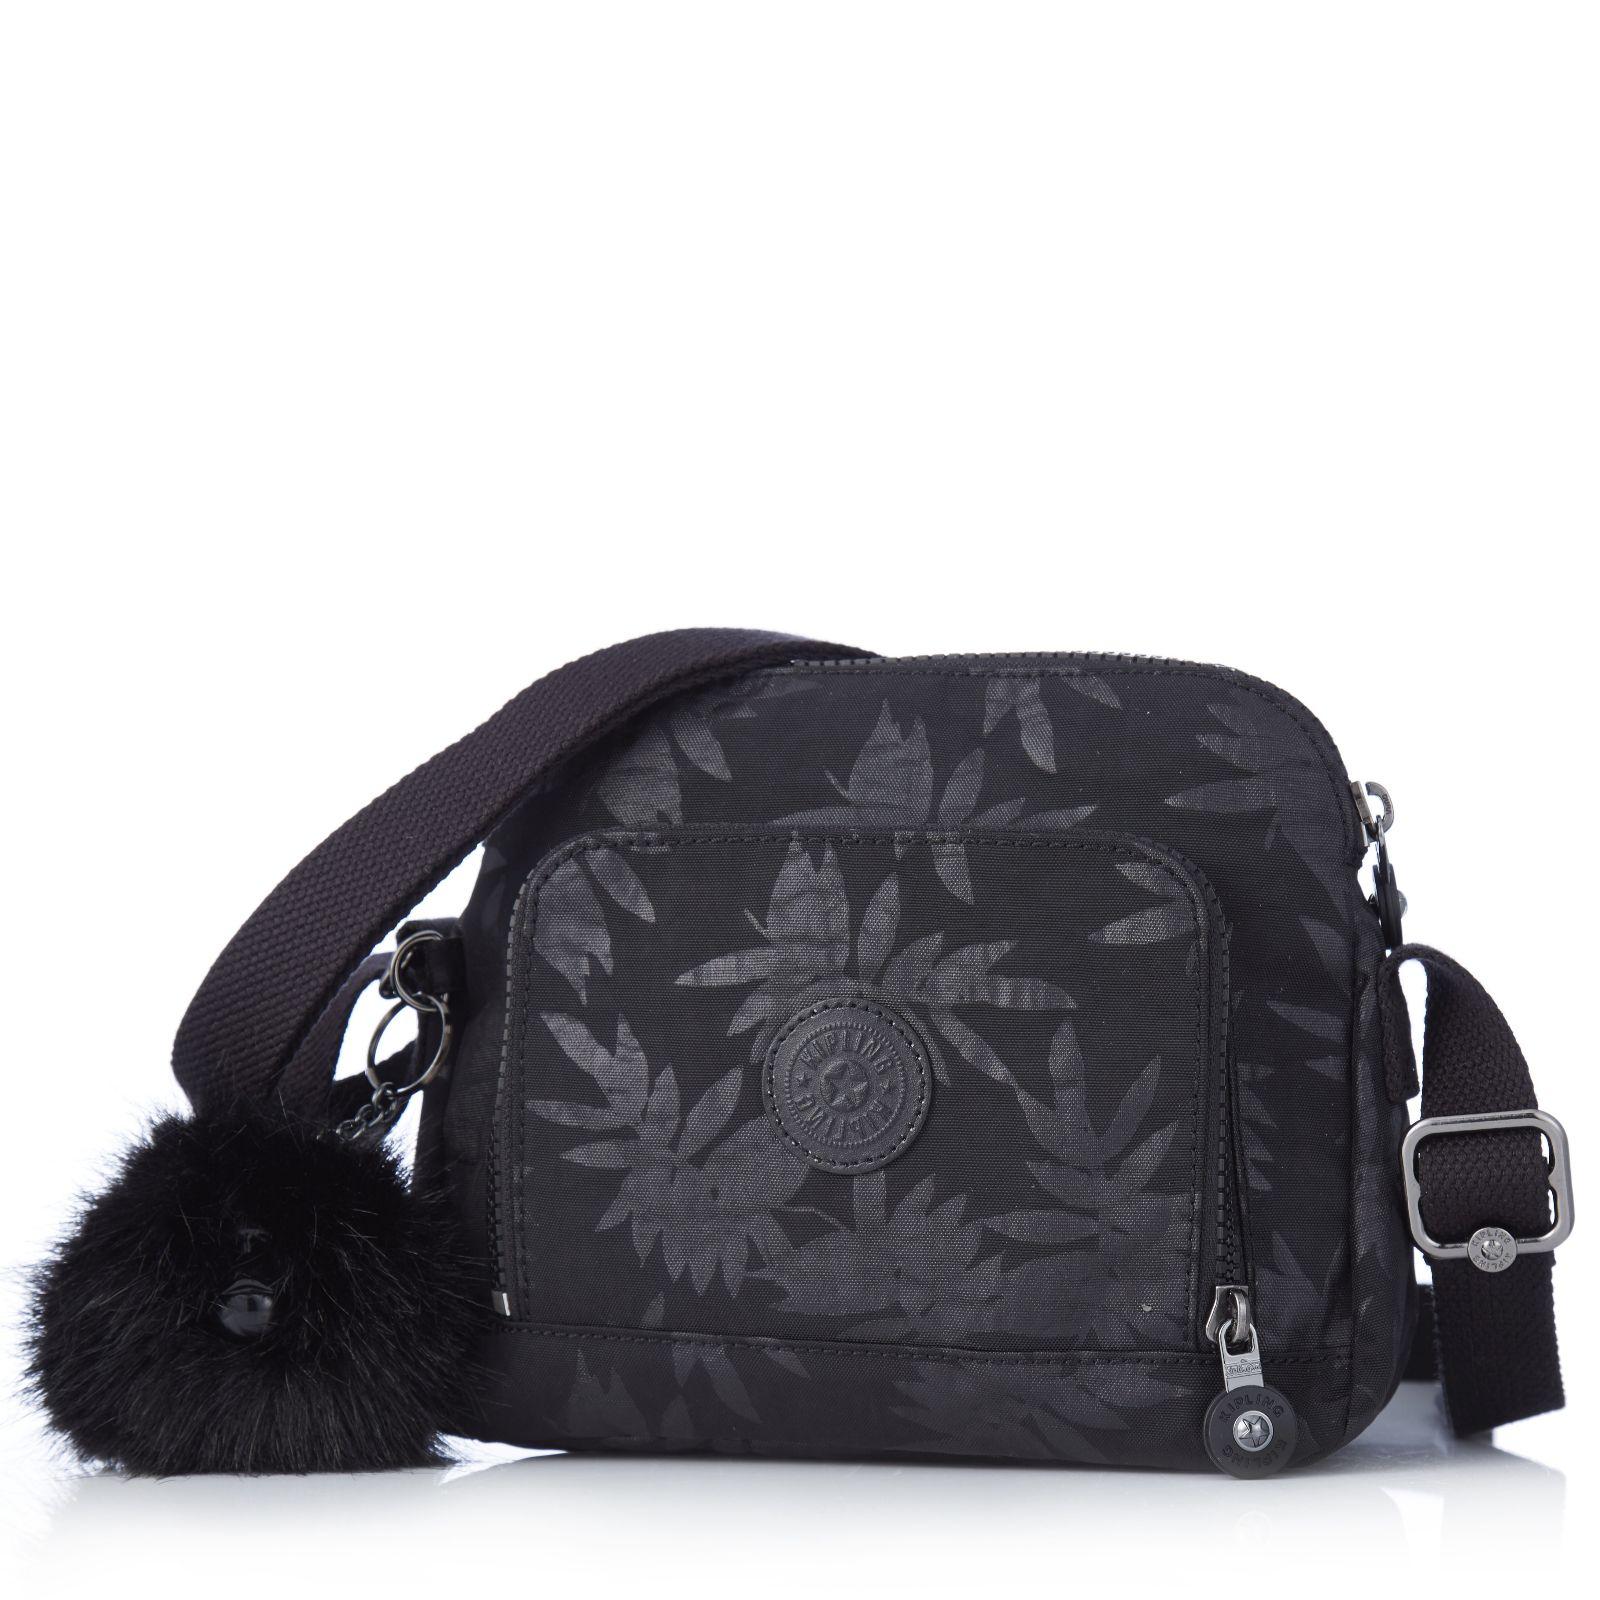 Kipling Wiske Premium Small Crossbody Bag Adjustable Strap Qvc Uk